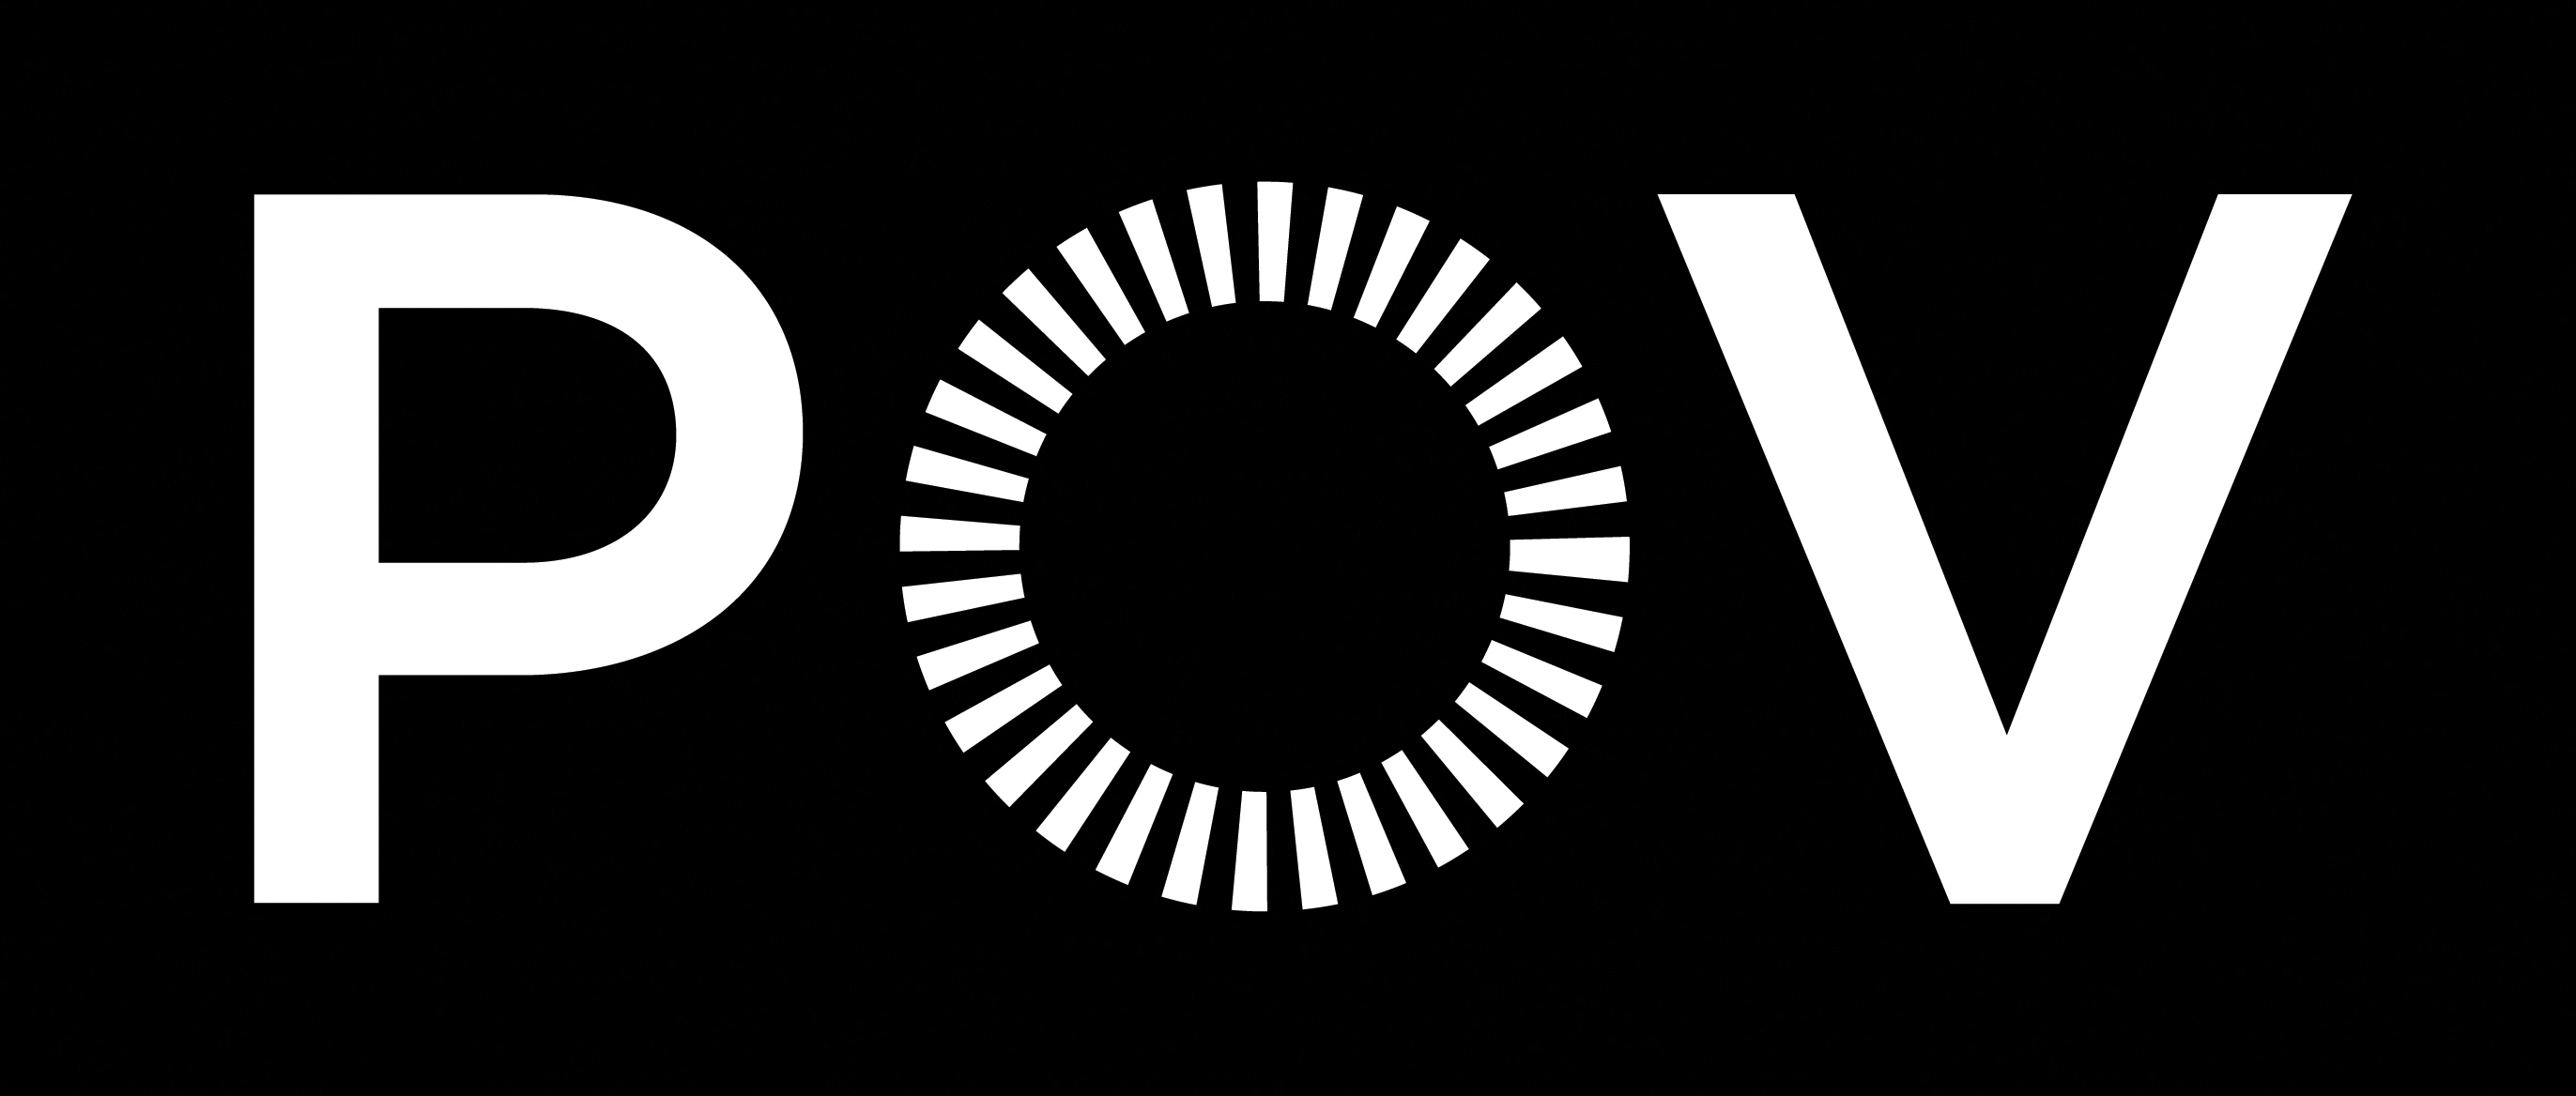 POV Logo (Photo Credit: American Documentary, Inc.)